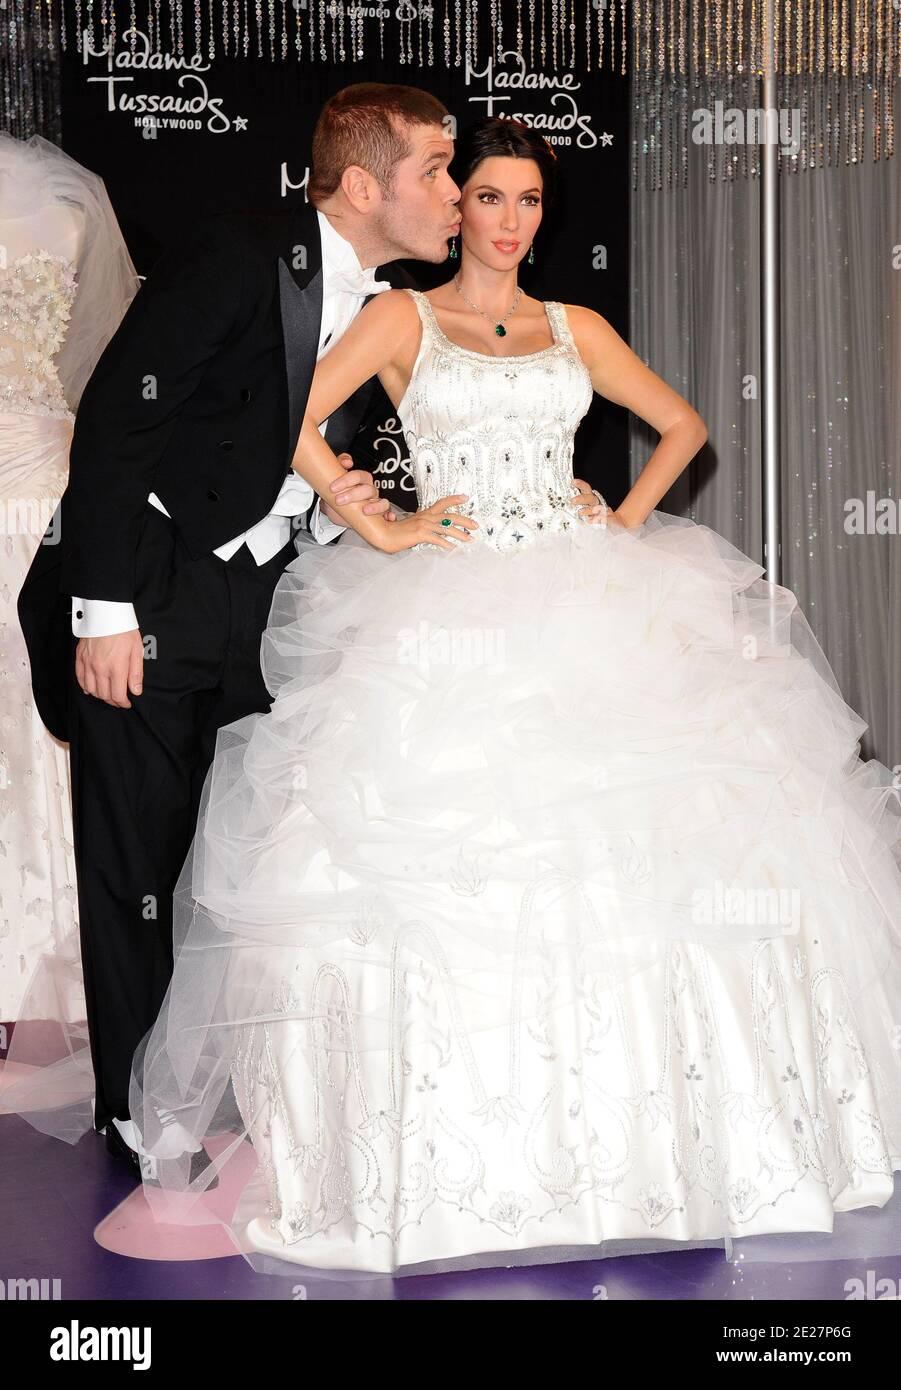 Kim Kardashian And Kris Humphries Wedding High Resolution Stock Photography And Images Alamy